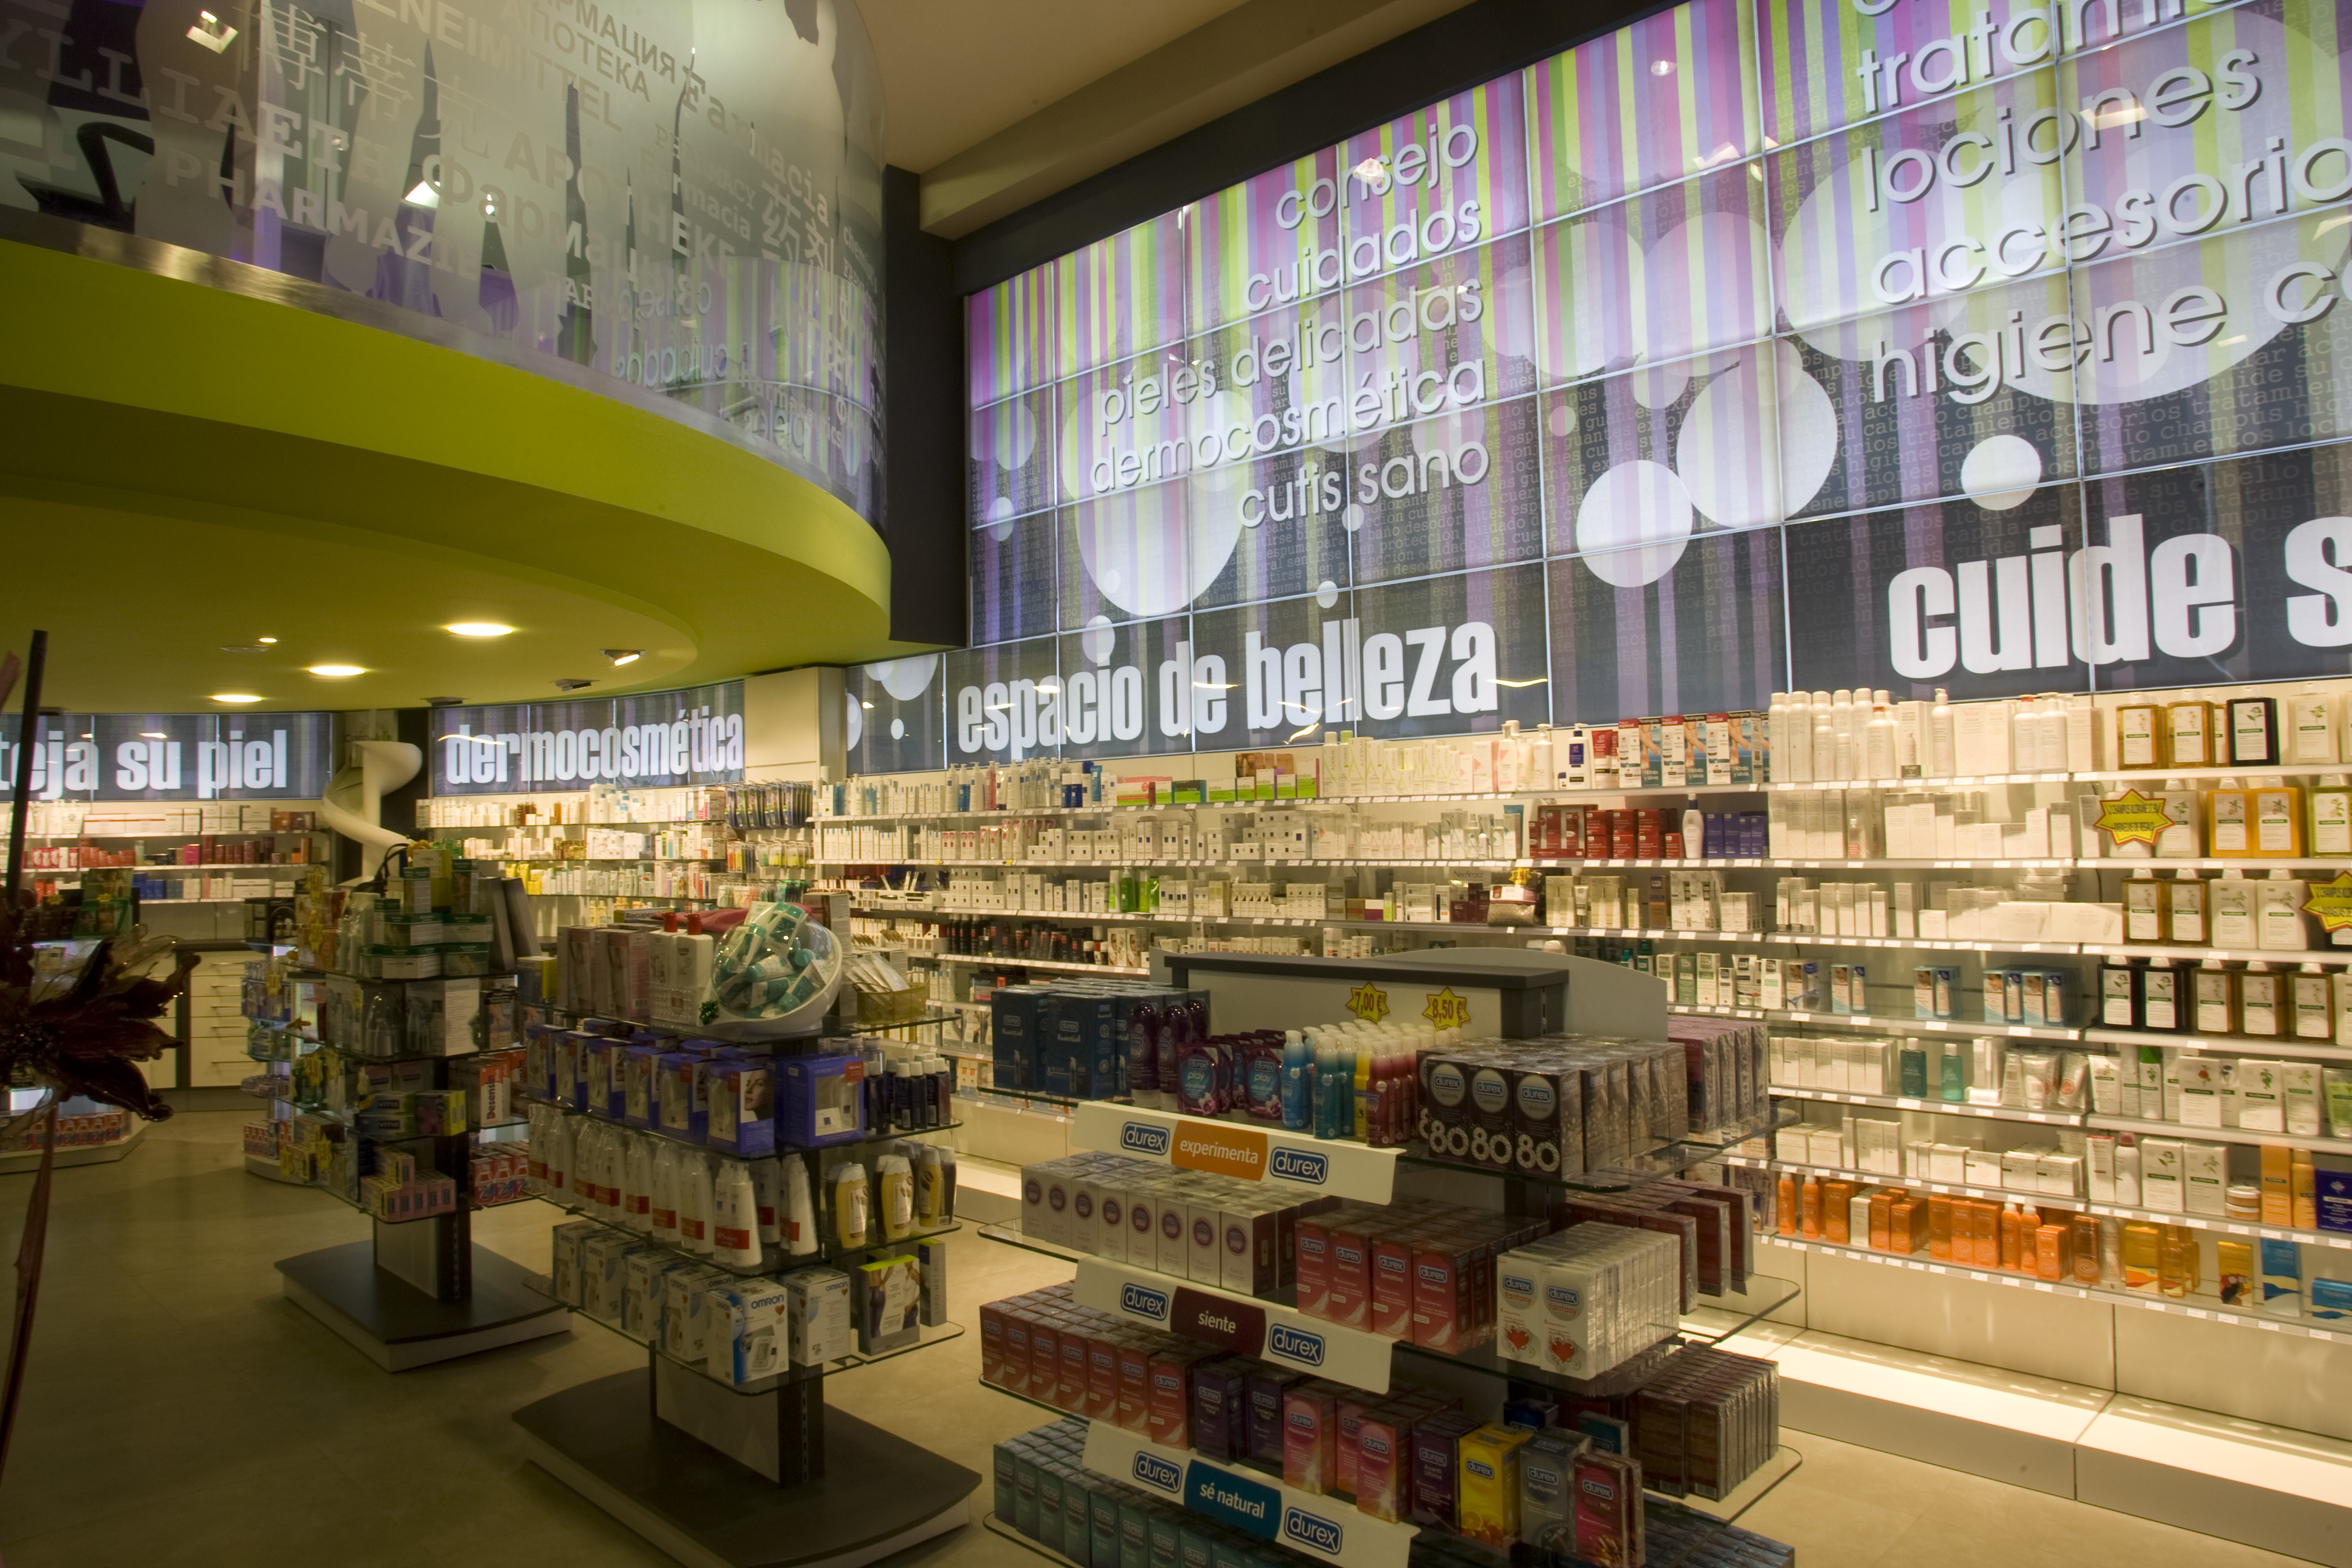 Farmacia Central - Interior